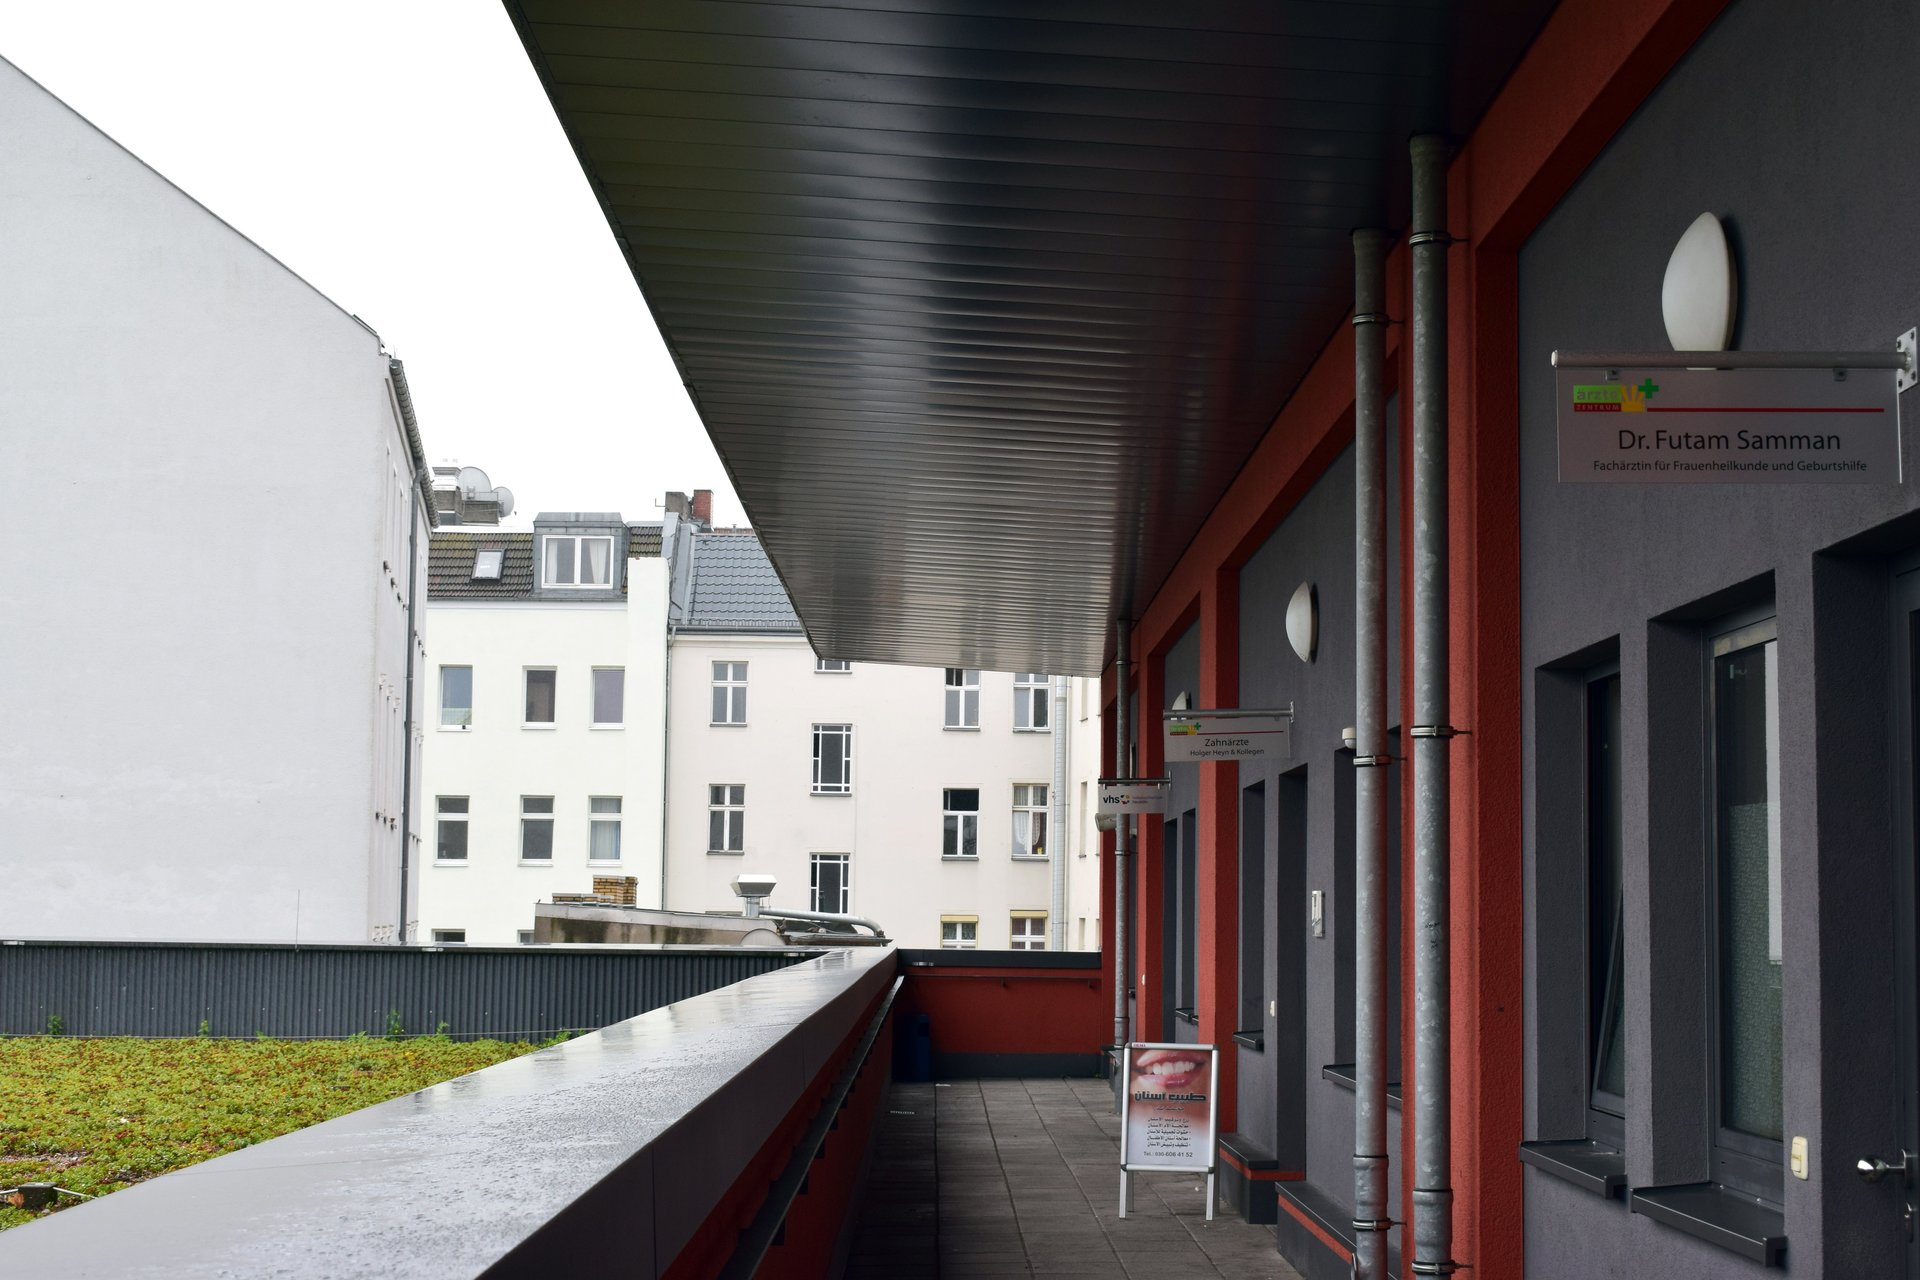 Herzlich willkommen in der Zahnarztpraxis Holger Heyn & Kollegen, Berlin-Neukölln